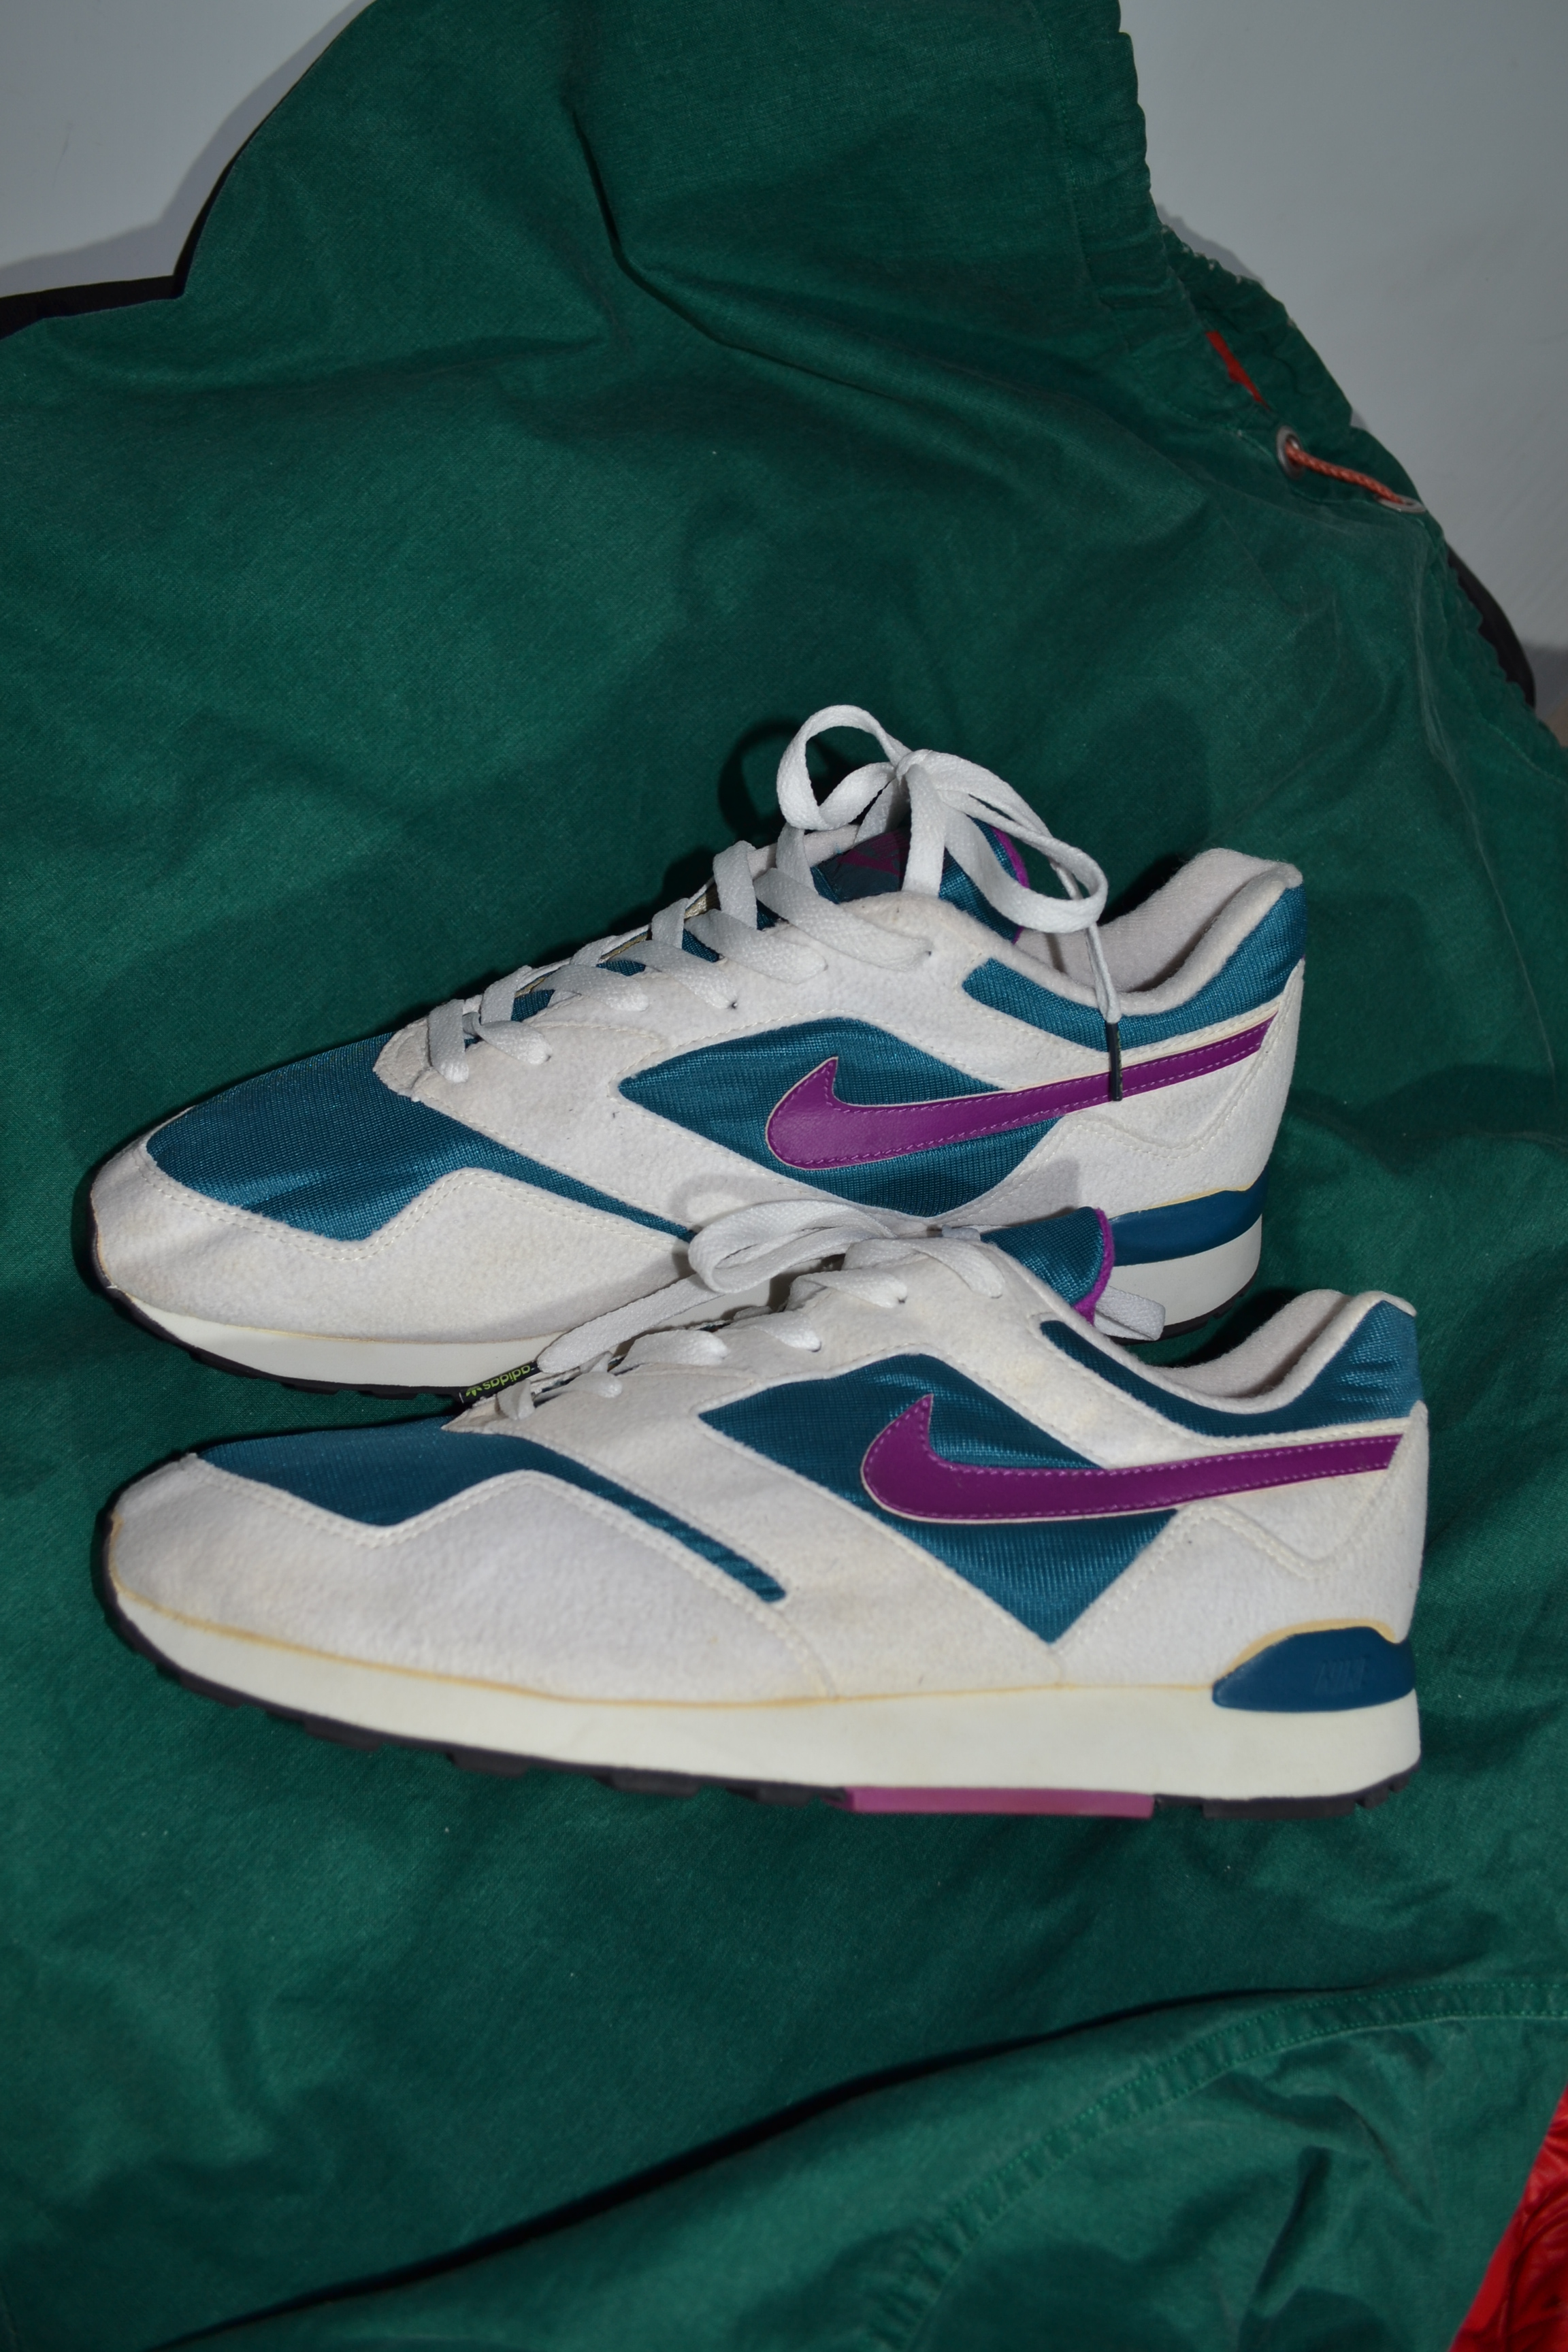 Inspector limpiar Política  Nike Nike Gauntlet Sneakers Shoes 46 Size 12 Us 11 Uk 1990s Deadstock Pair  Air Vintage   Grailed